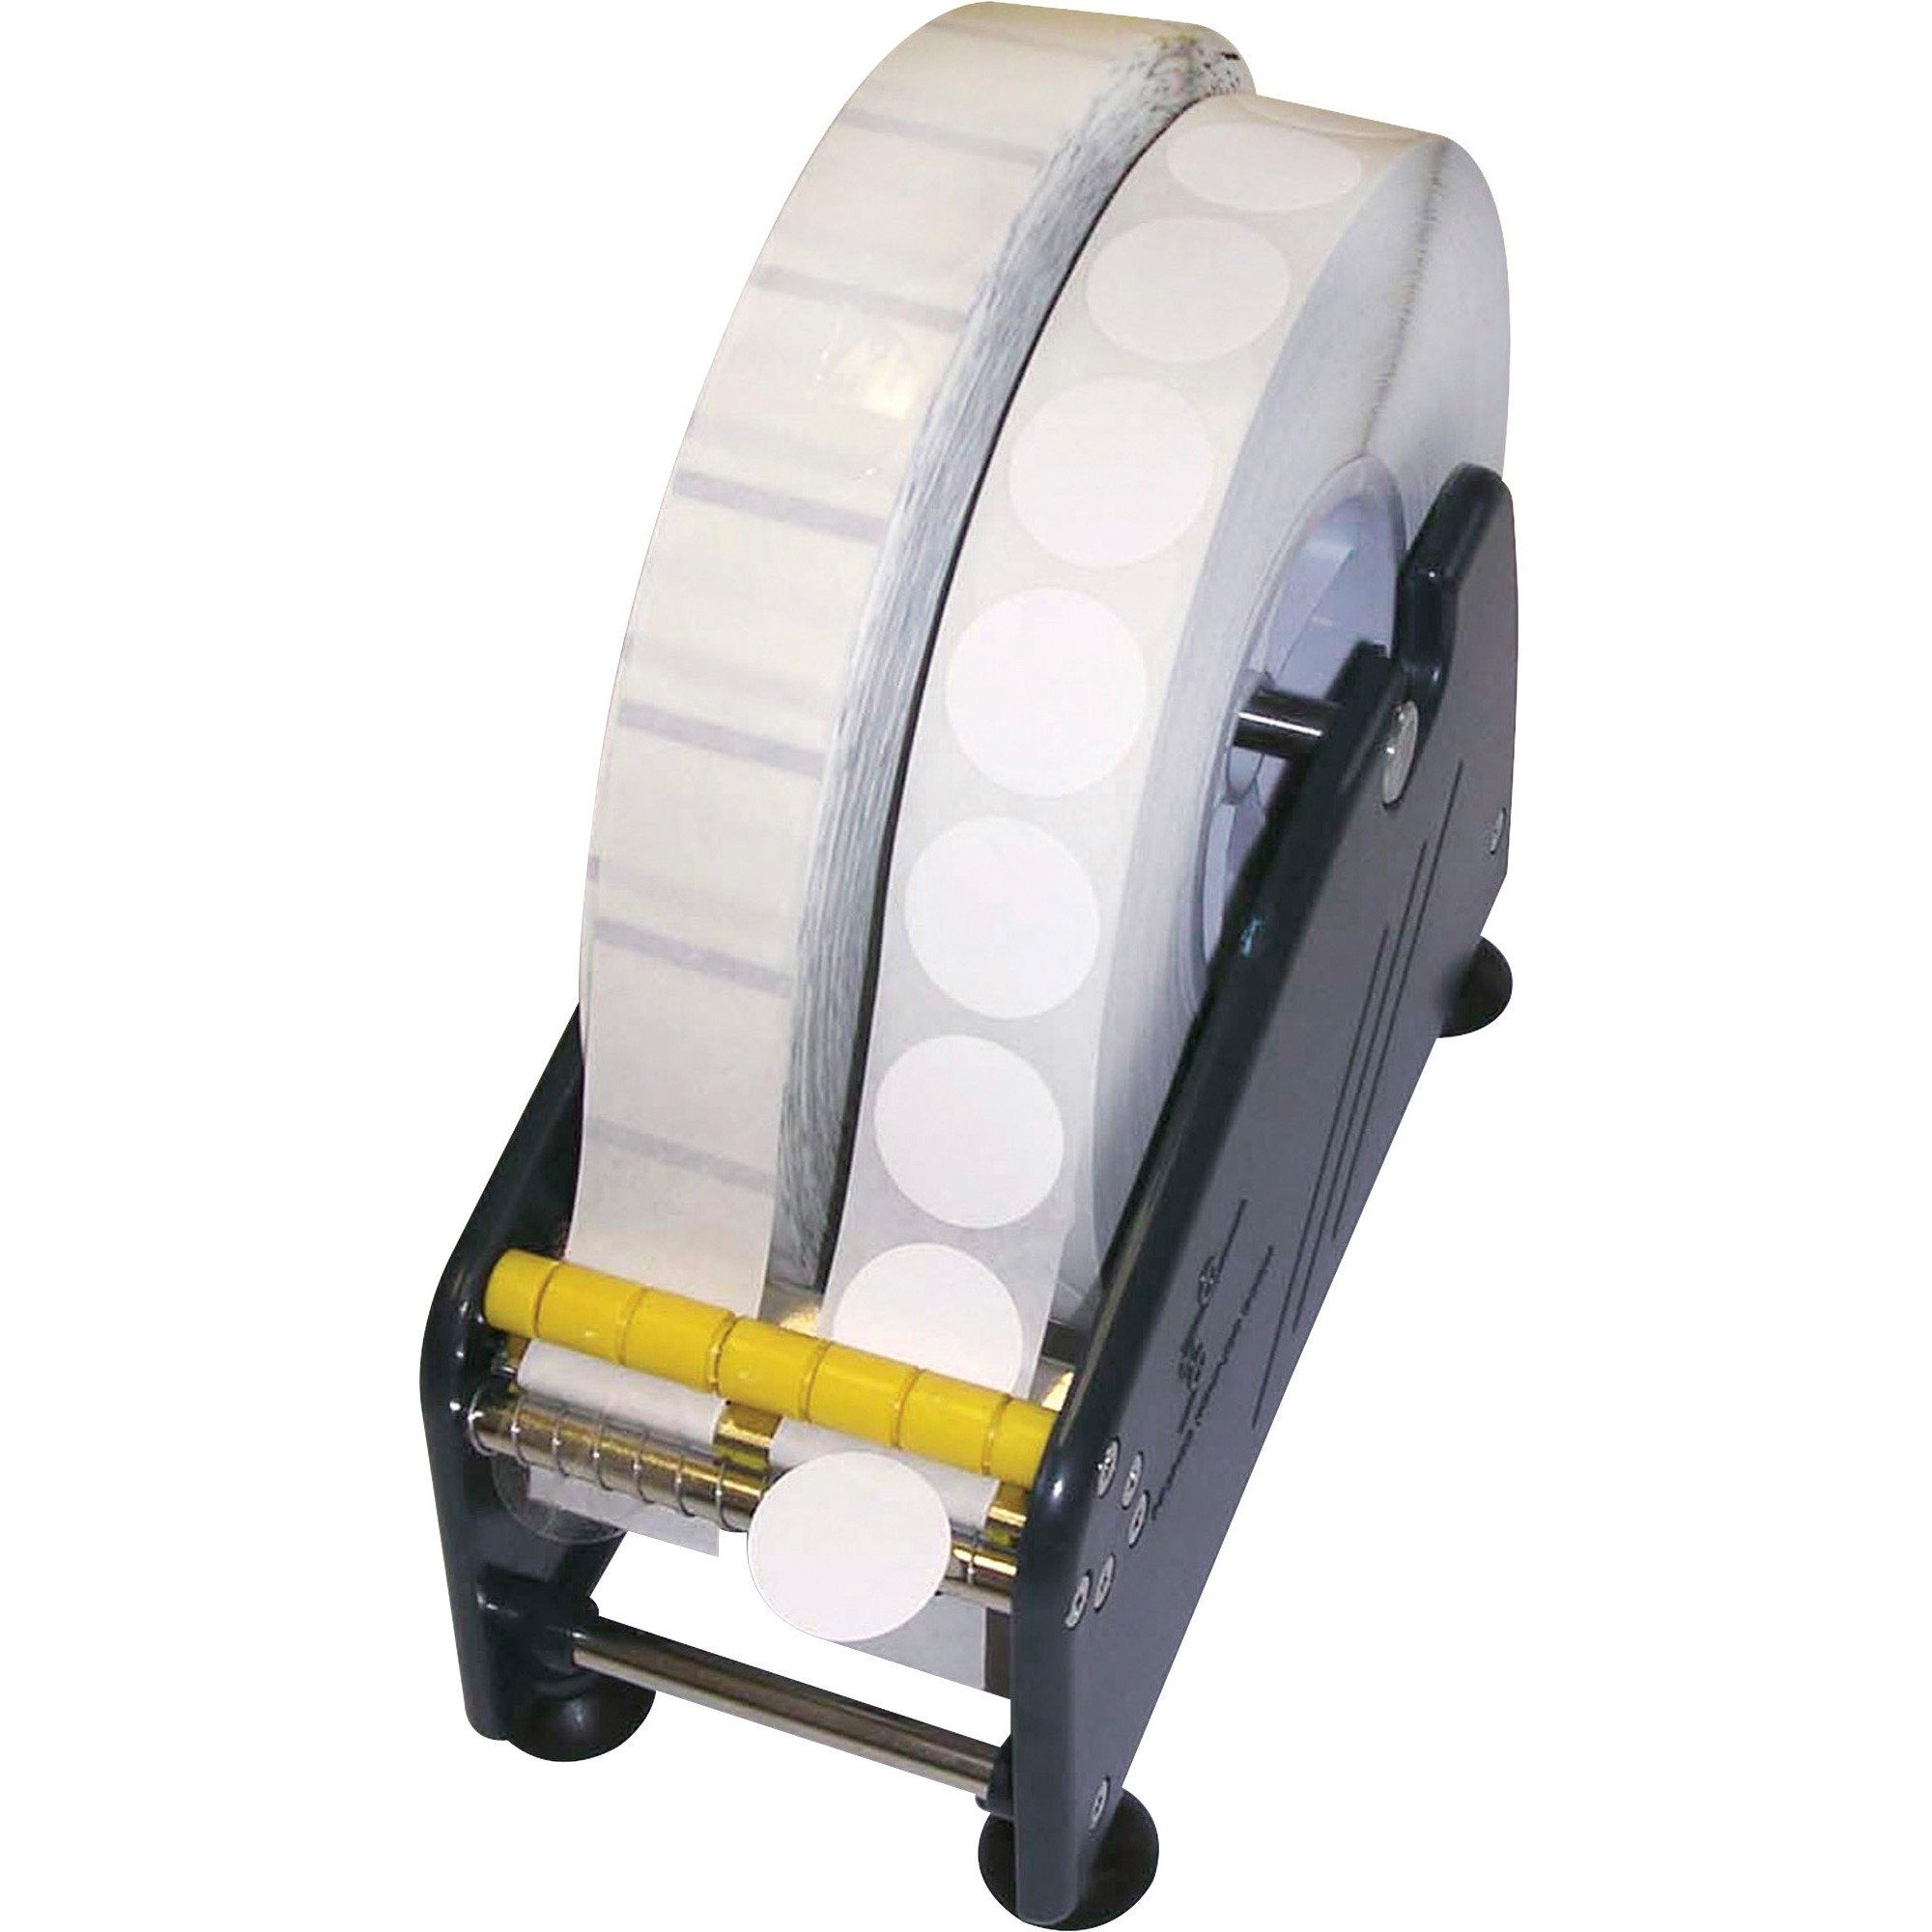 Tatco Adhesive Back Mailing Seals, TCO36100, 1in. Diameter, 3in. Core, Translucent, 5,000 per Roll